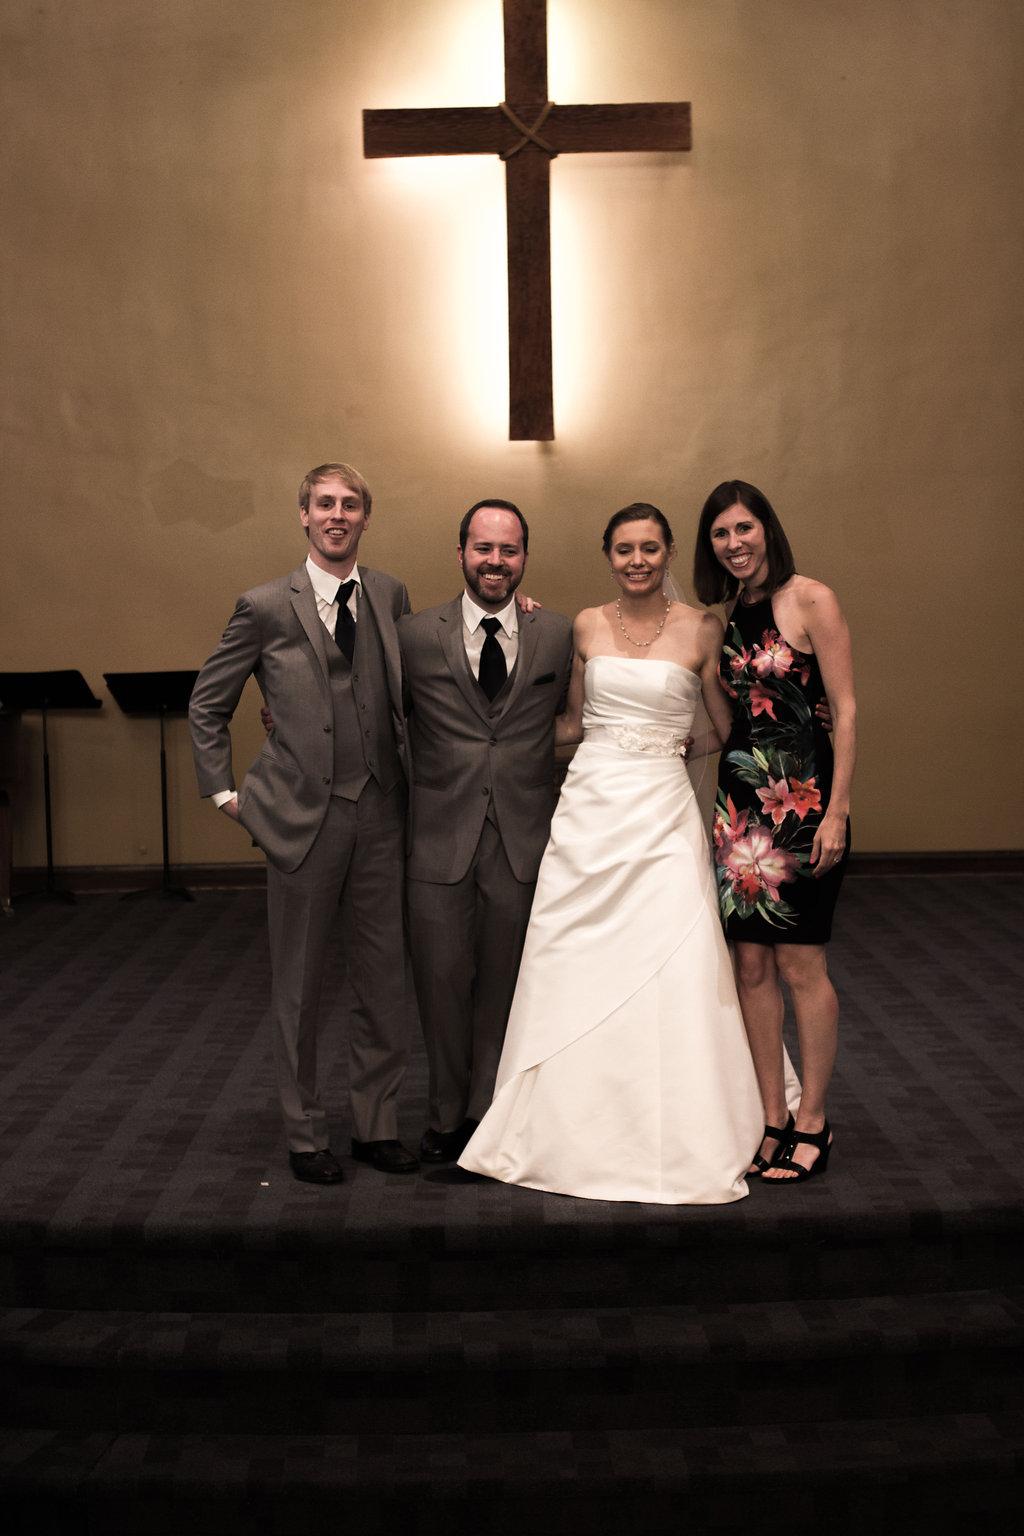 jakeandsuze_weddingselects-131.jpg